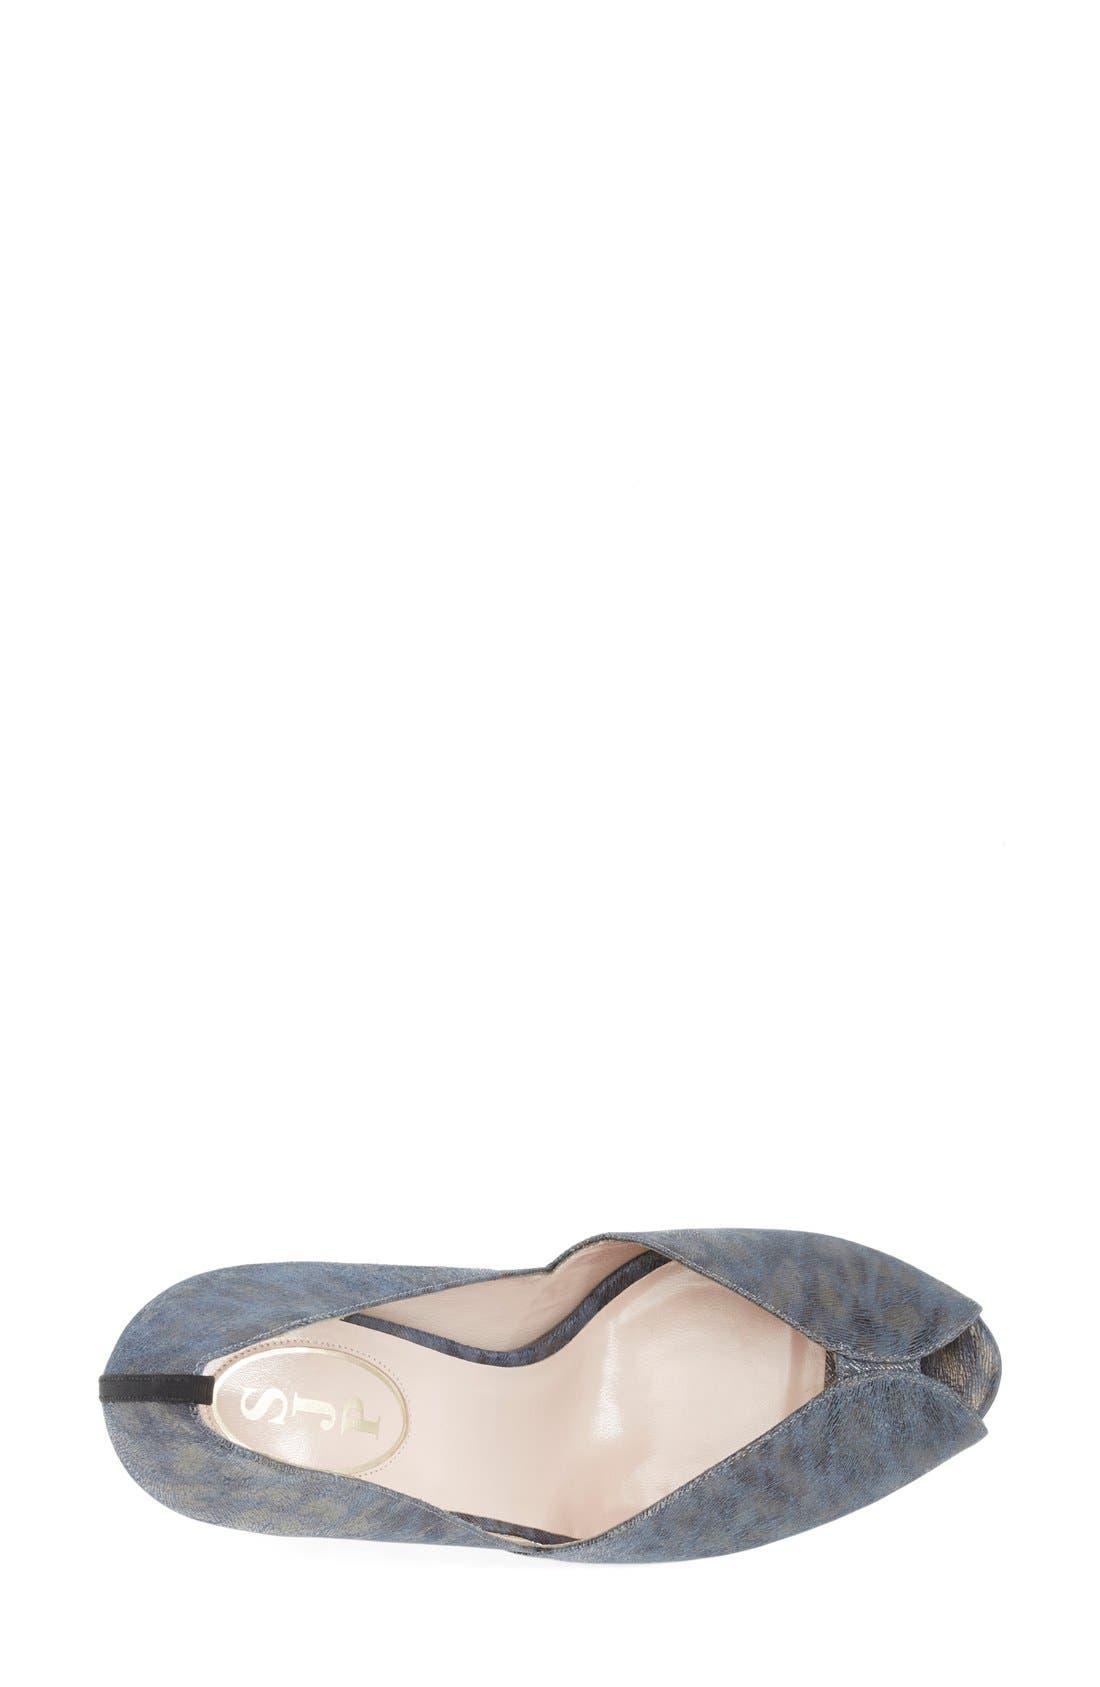 'Naomi' Peep Toe Pump,                             Alternate thumbnail 3, color,                             Blue Leopard Leather